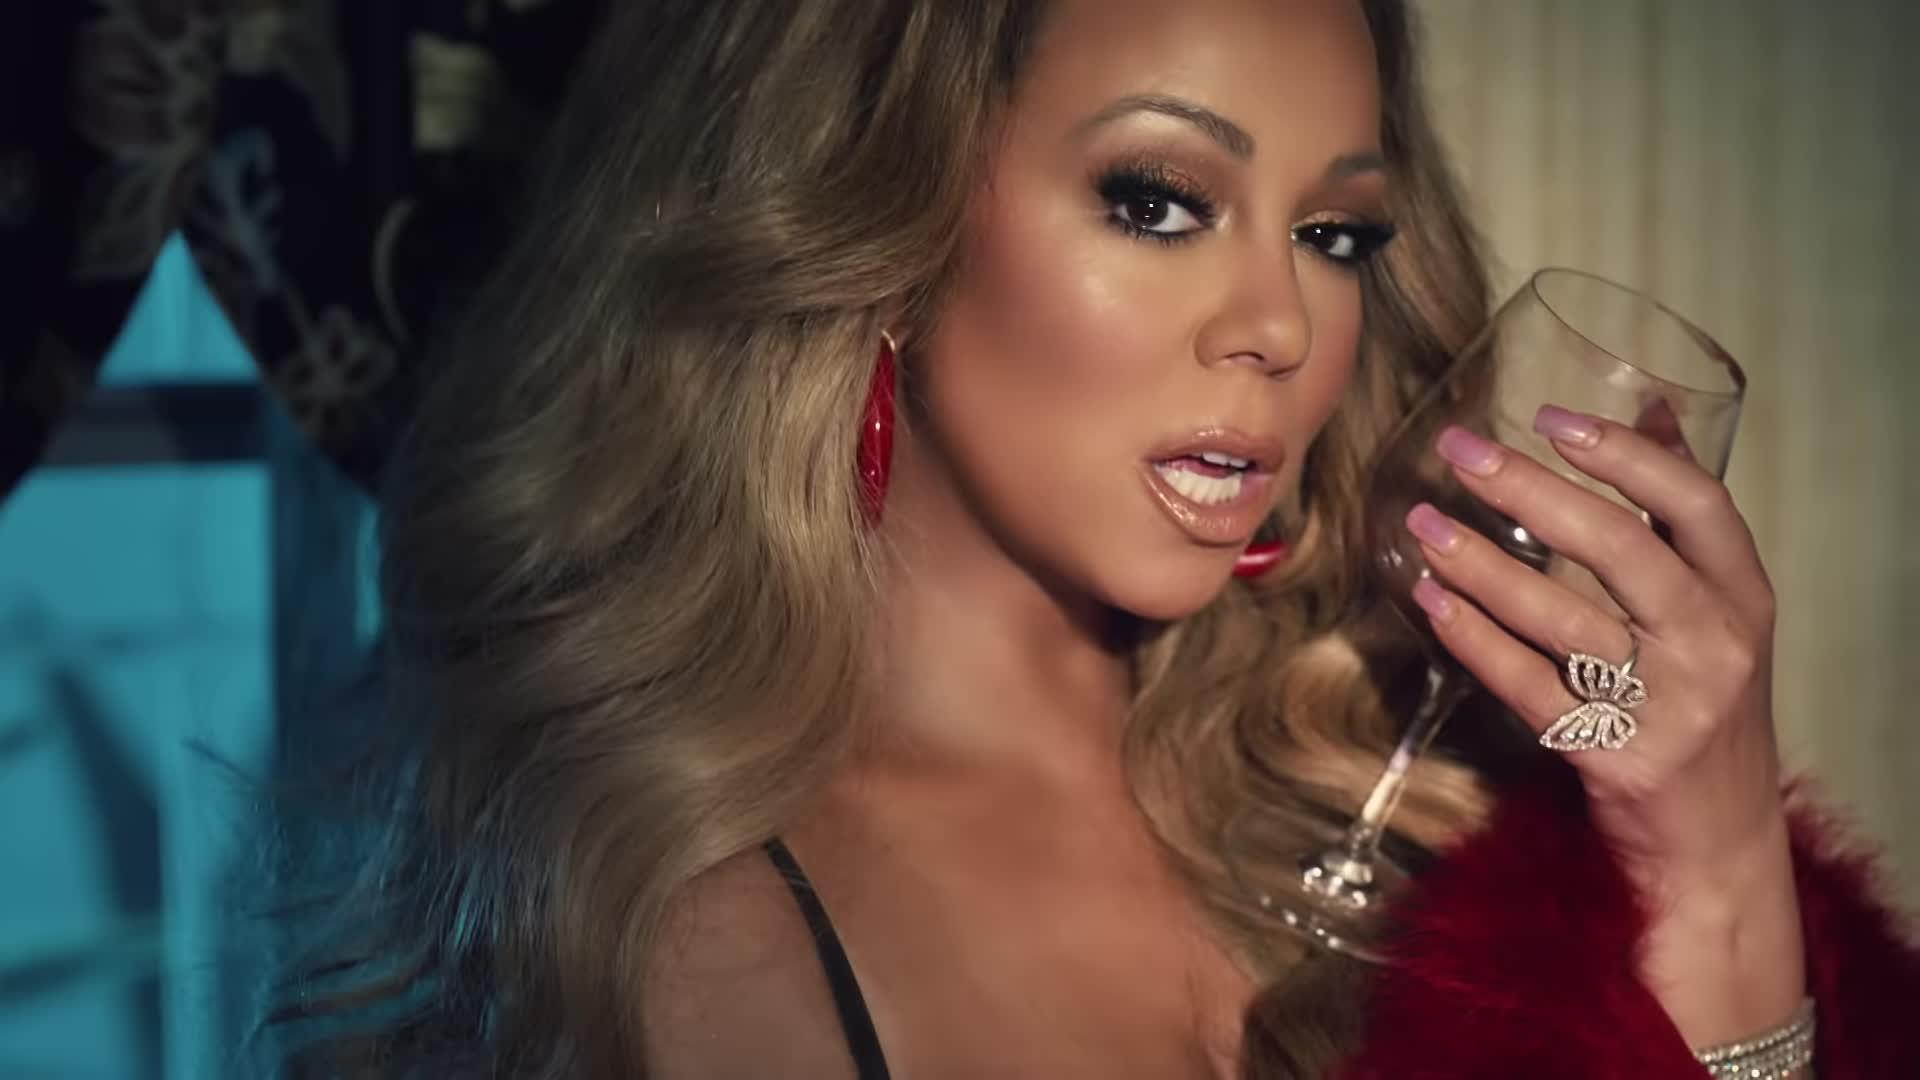 Epic, GTFO, Mariah Carey, MariahCareyVEVO, Music, R&B, GTFO GIFs